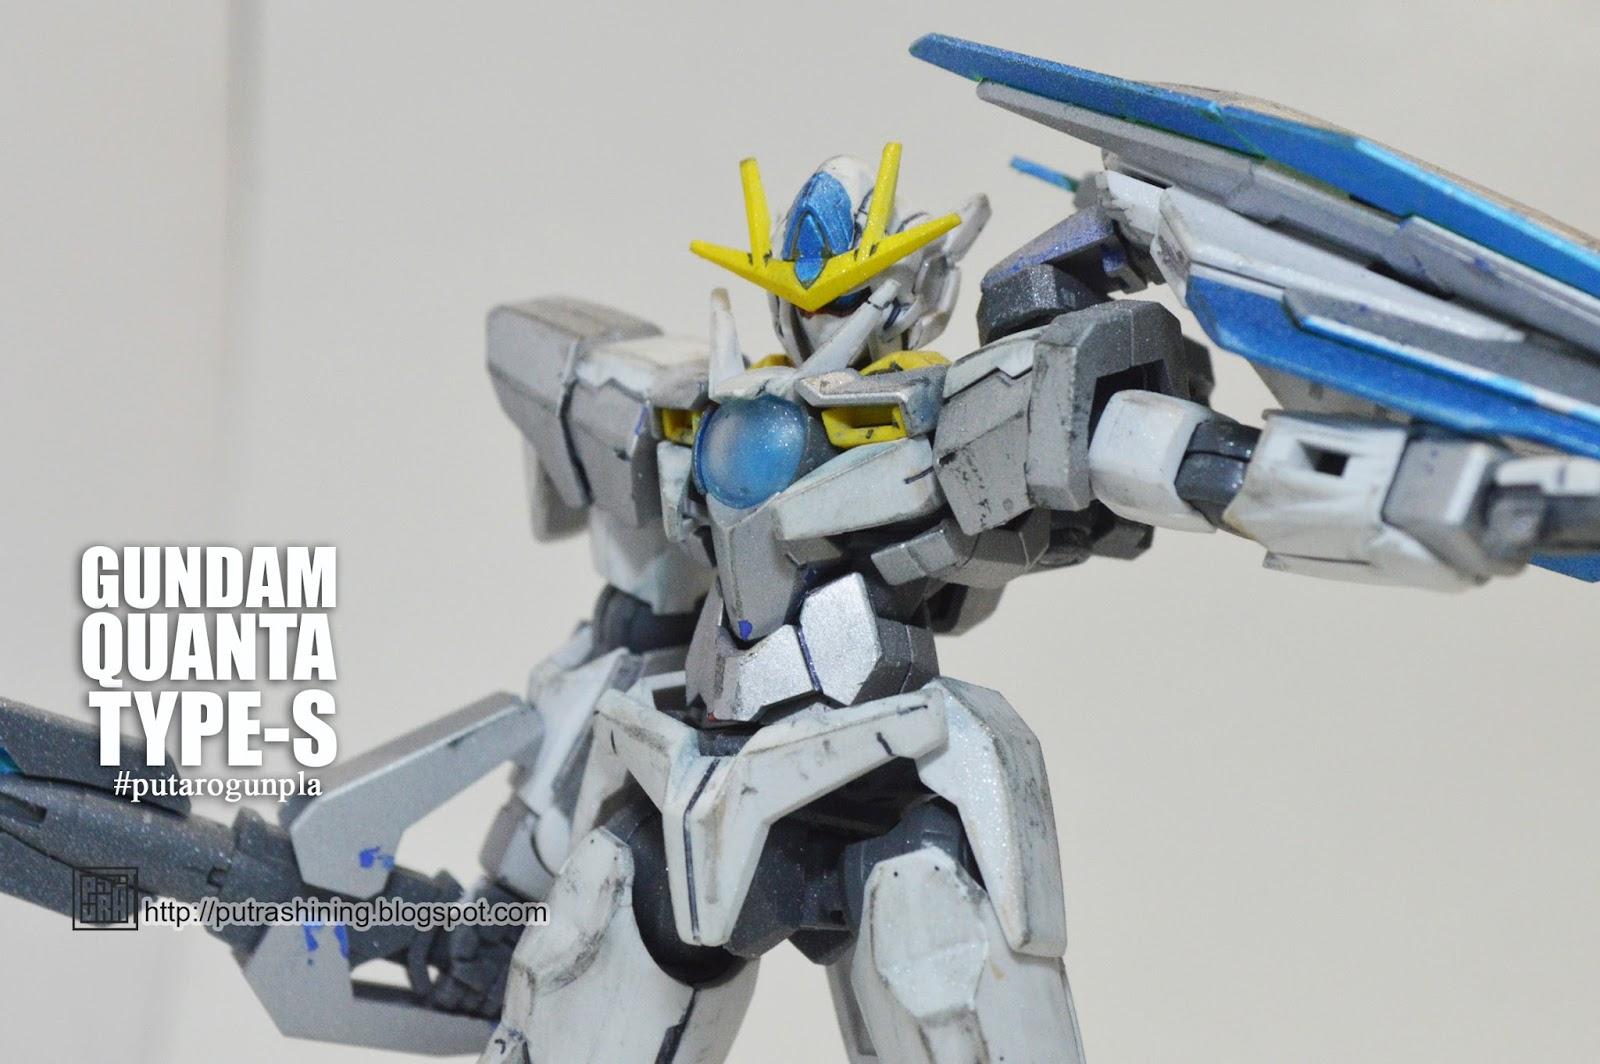 Qan Simple Mg Qant With Awesome Concept Color Ver By Bandai 1 144 Hgoo Gnt 0000 00 Qanta Hg Quanta Custom Build Putra